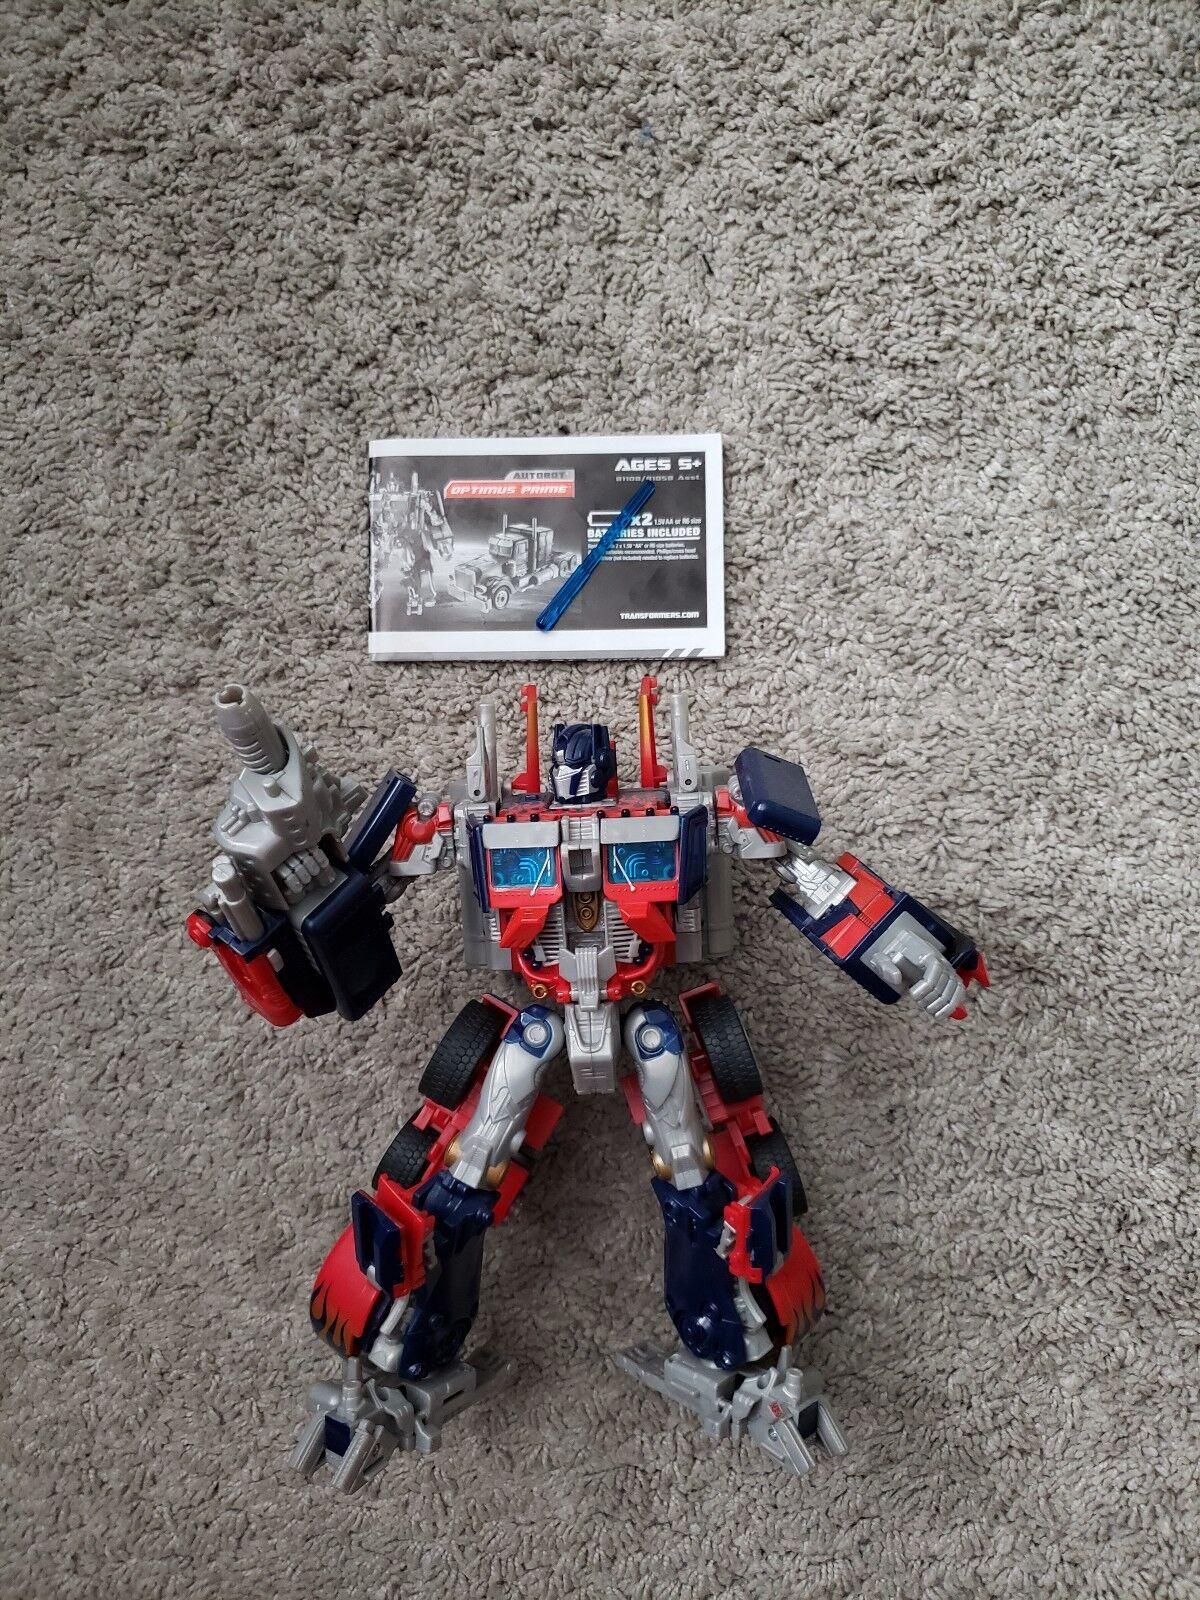 Hasbro Transformers Optimus Prime Prime Prime Autobot Action Figure 41f693